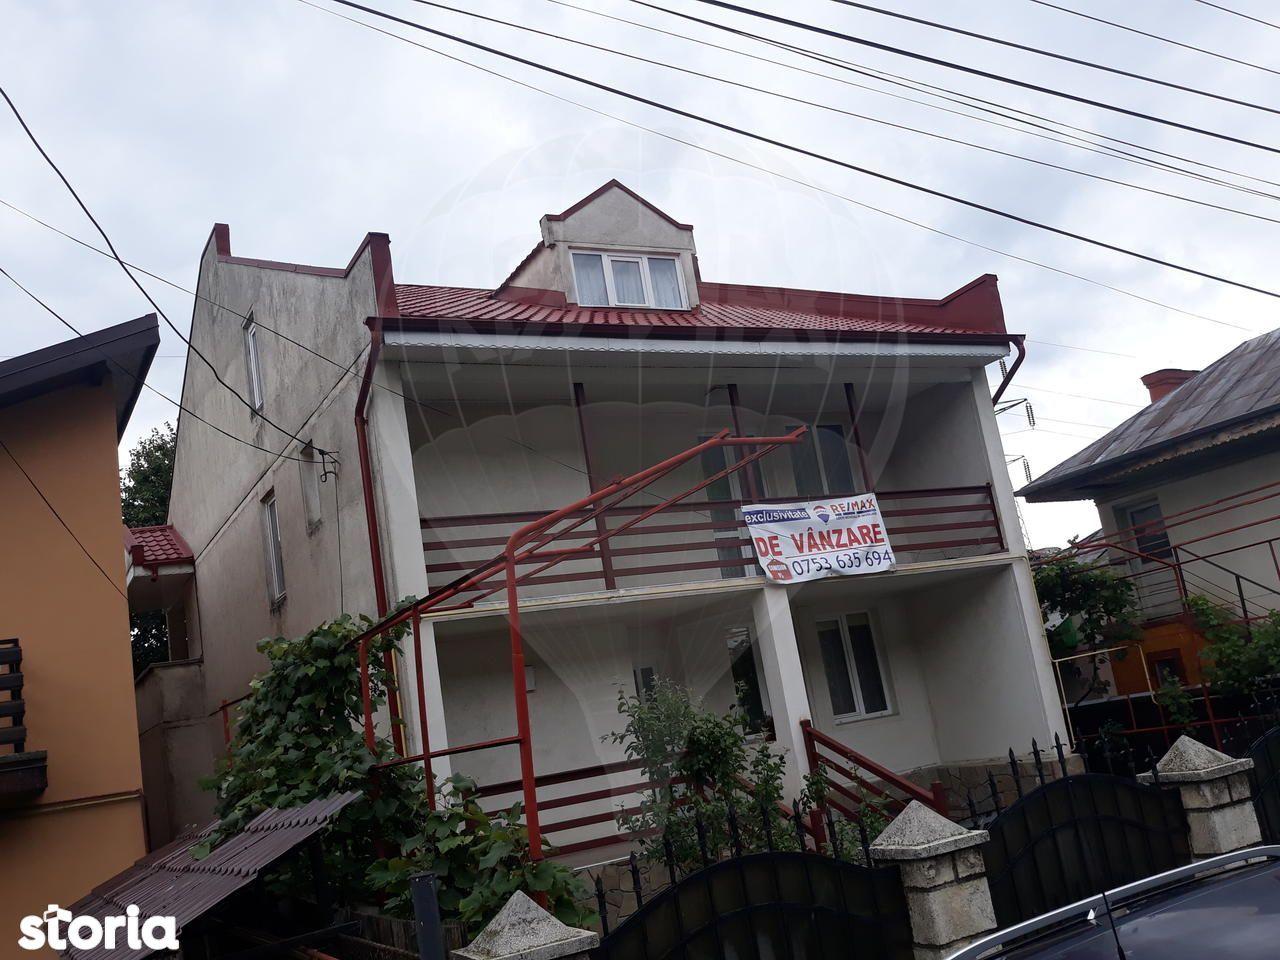 Casa de vanzare, Neamț (judet), Strada Nicu Albu - Foto 1